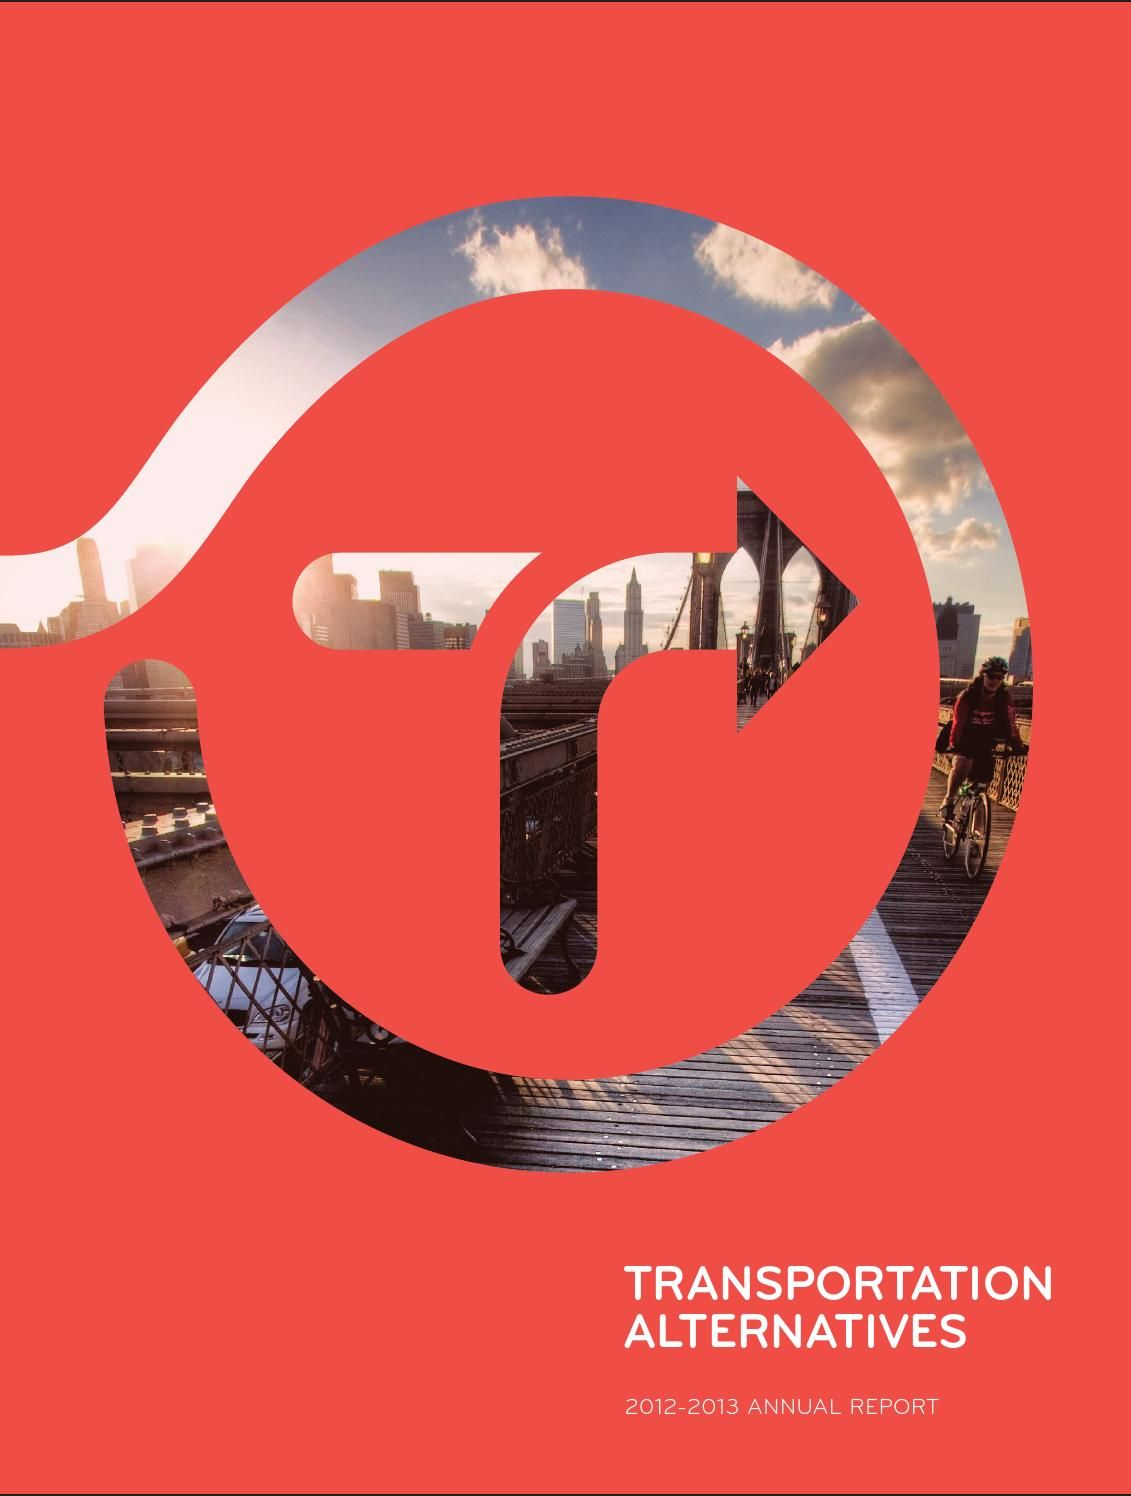 Font&L/O ref Transportation Alternatives' 40th Anniversary Annual Report